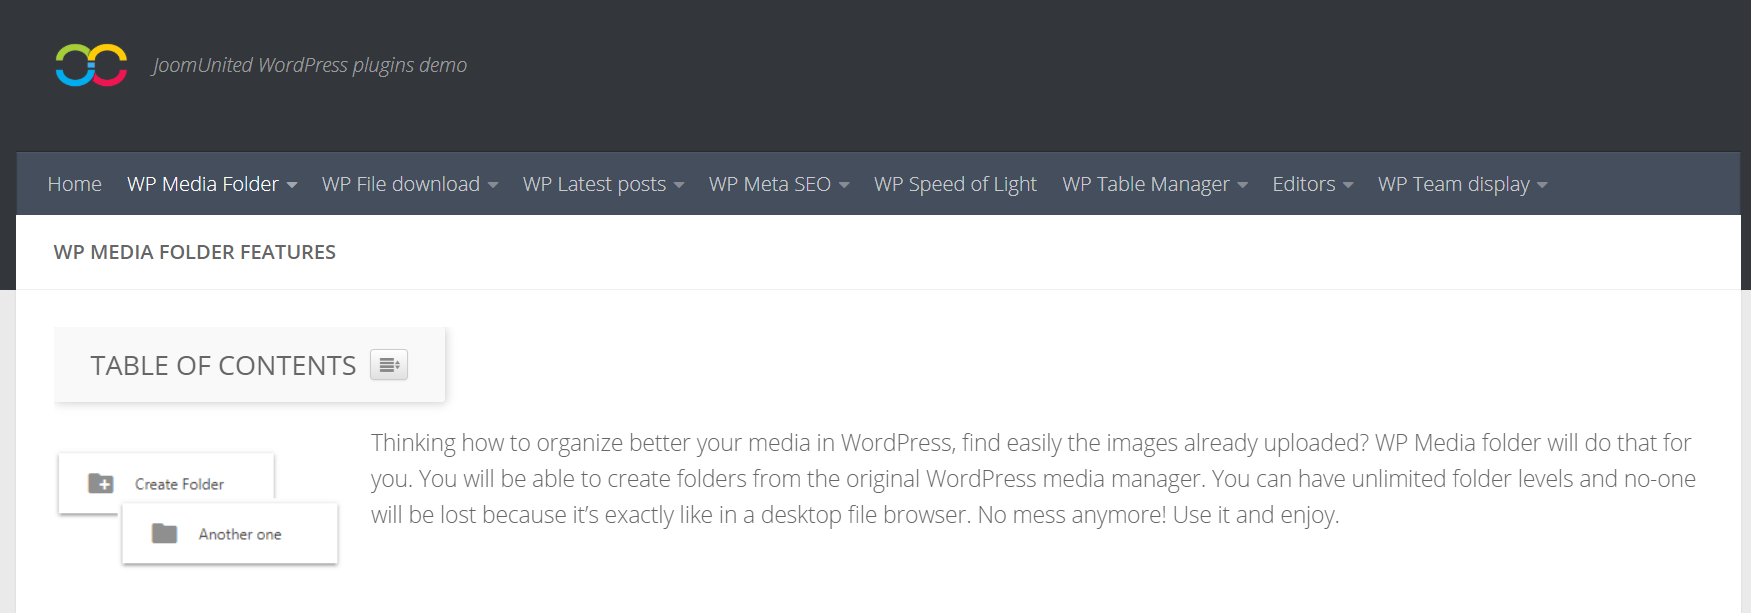 WP Media Folder Review– JoomUnited WordPress demo